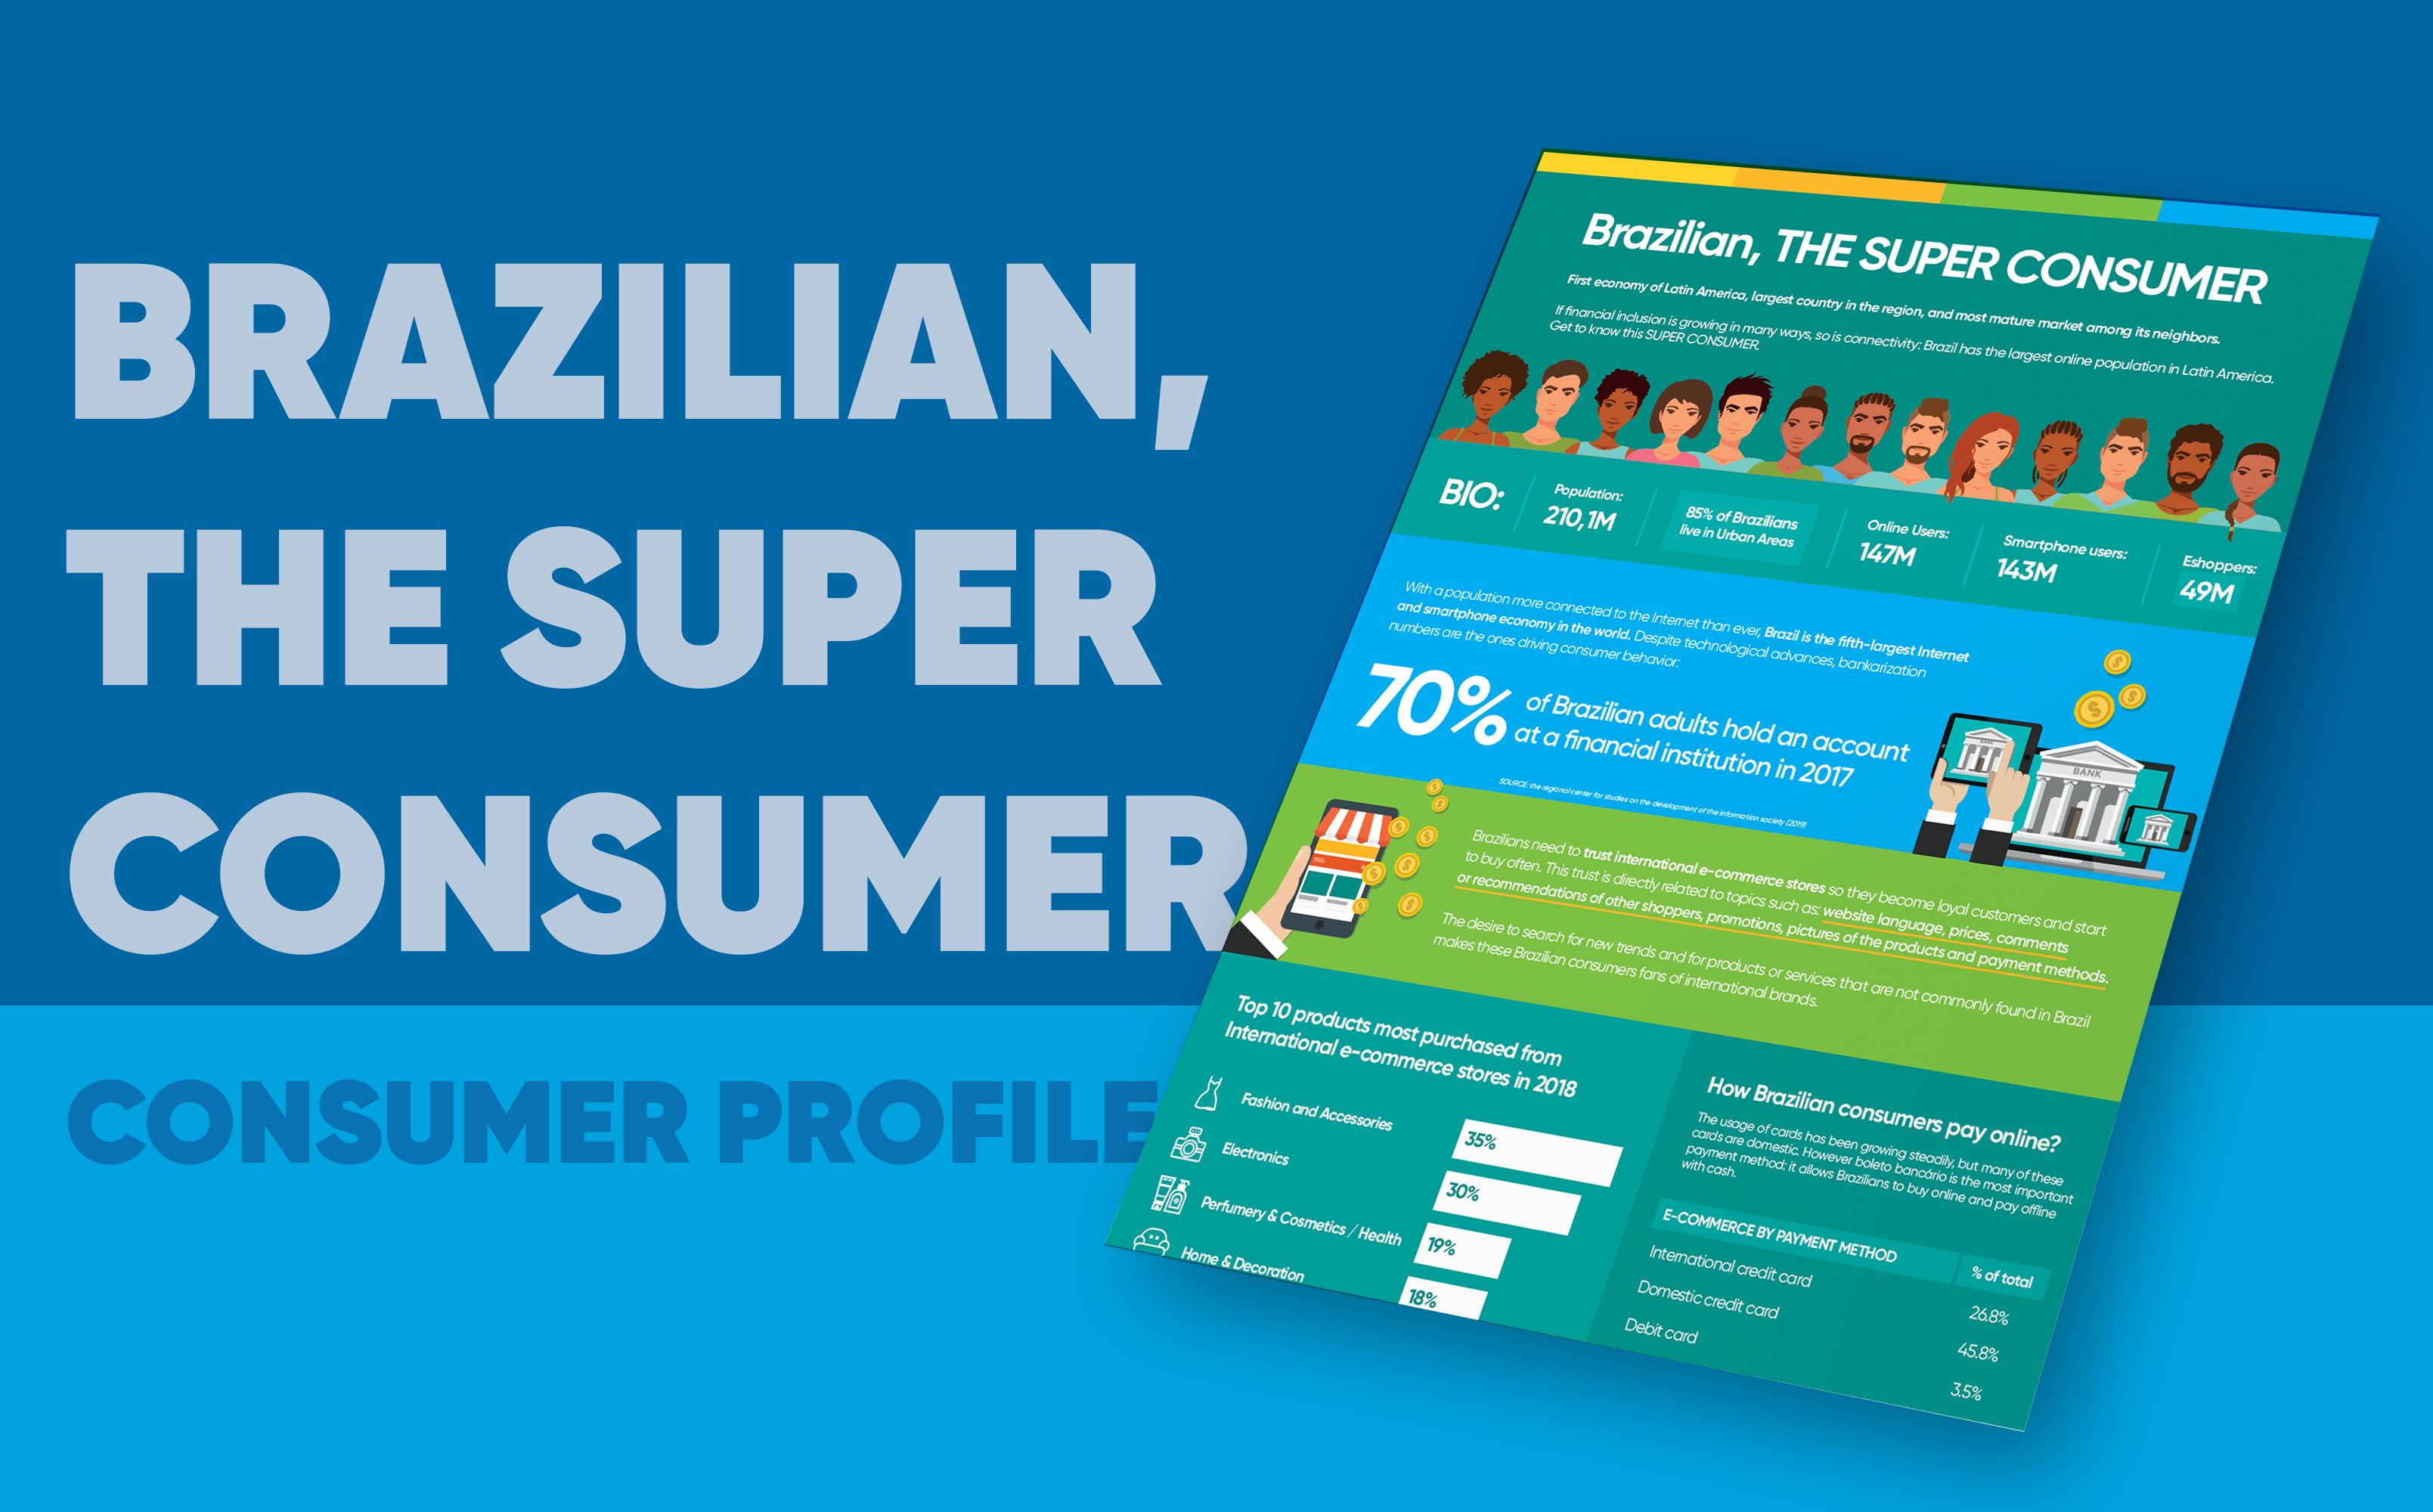 BrazilianConsumer